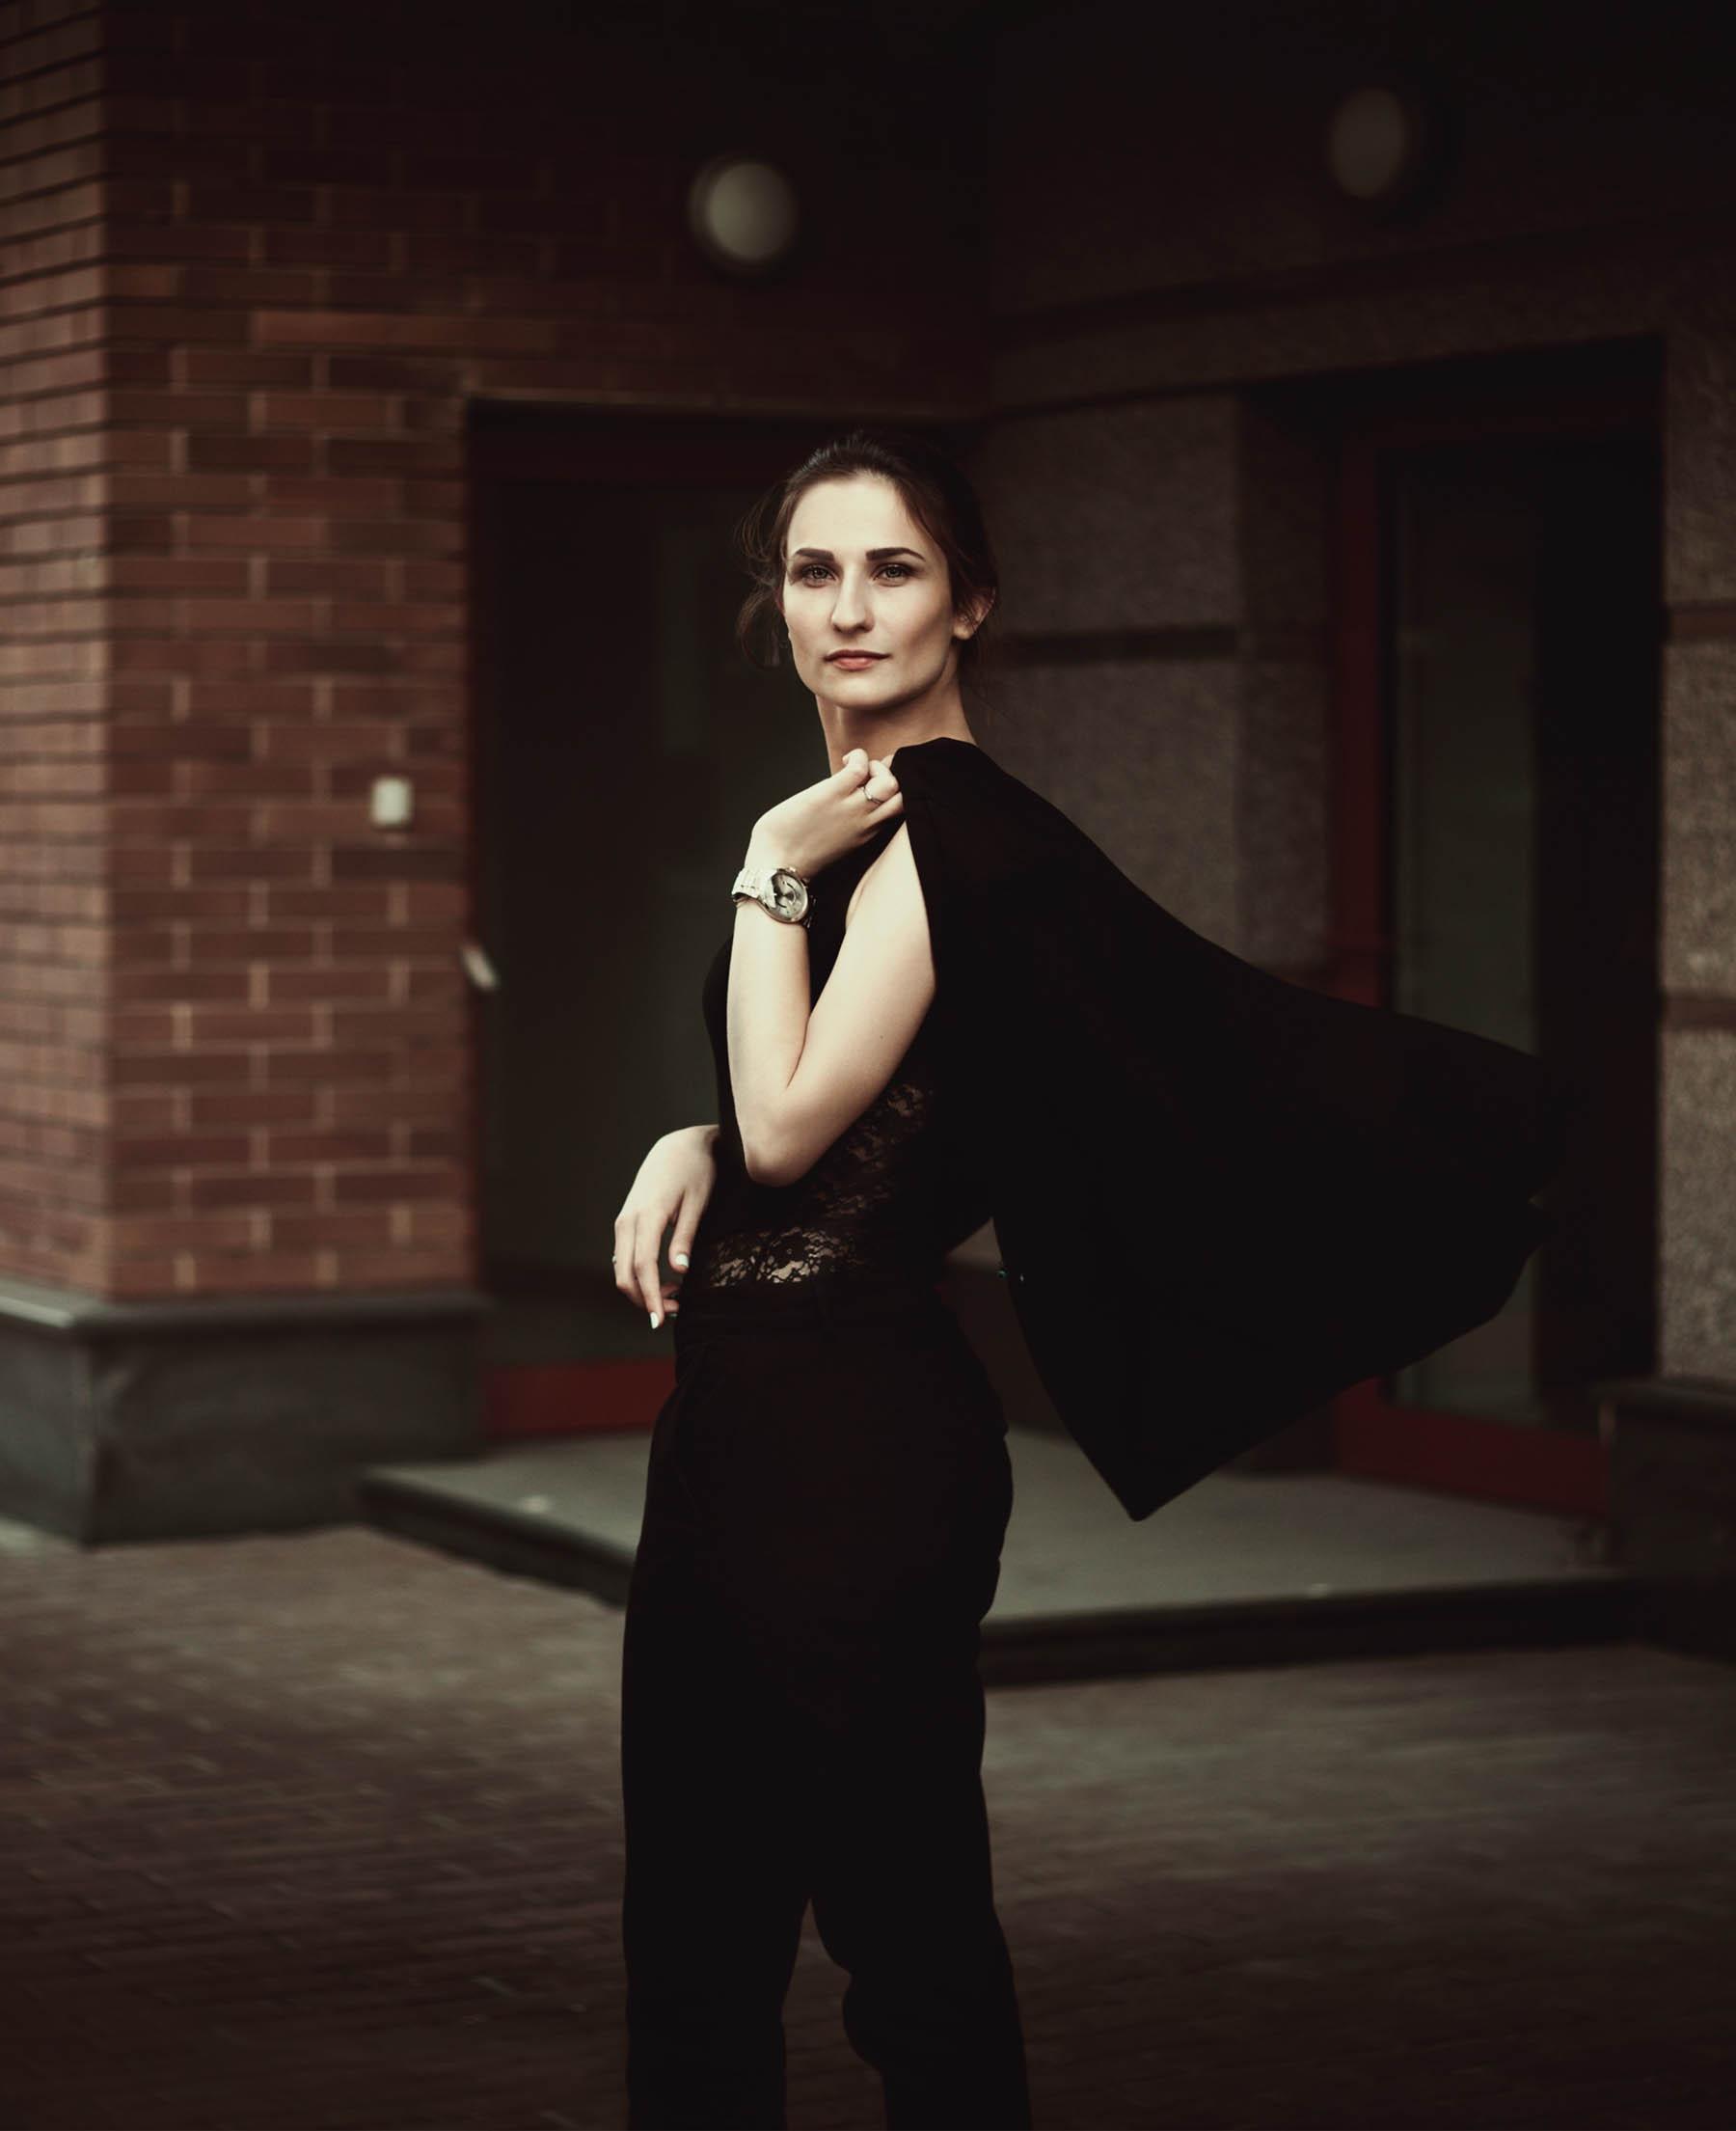 gallery-3-woman_blackdress.jpg